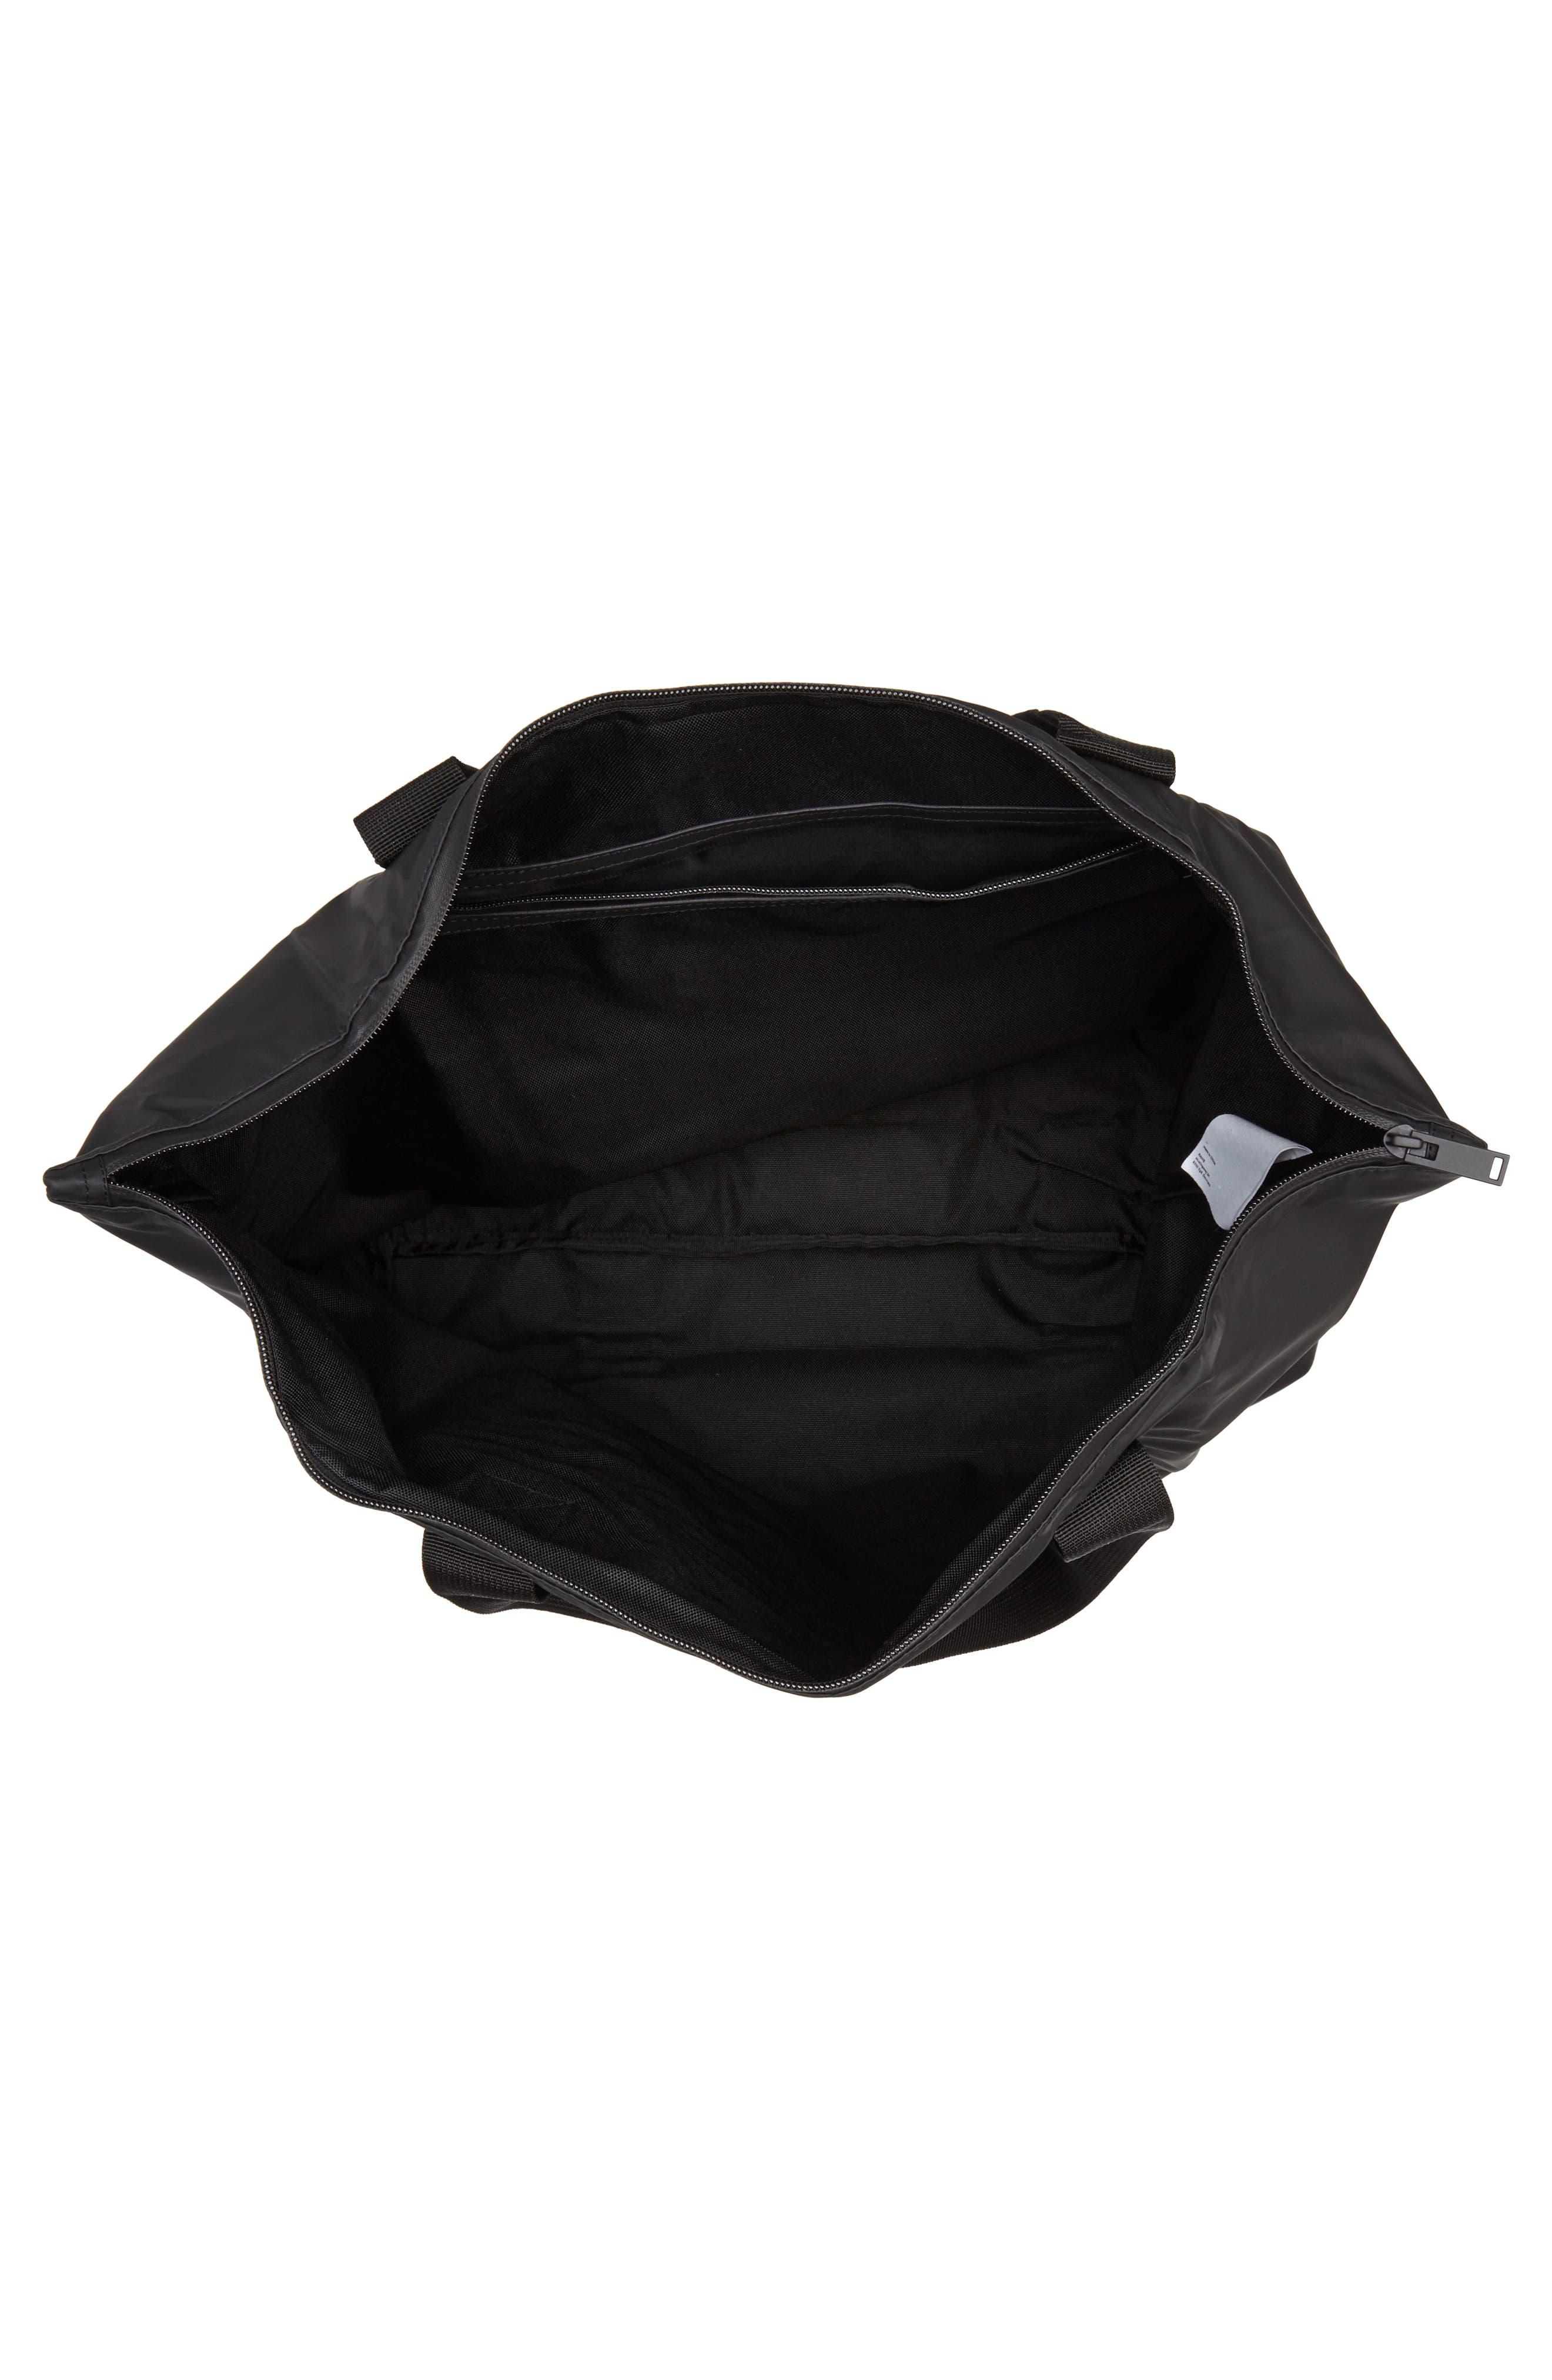 Waterproof Tote Bag,                             Alternate thumbnail 4, color,                             BLACK